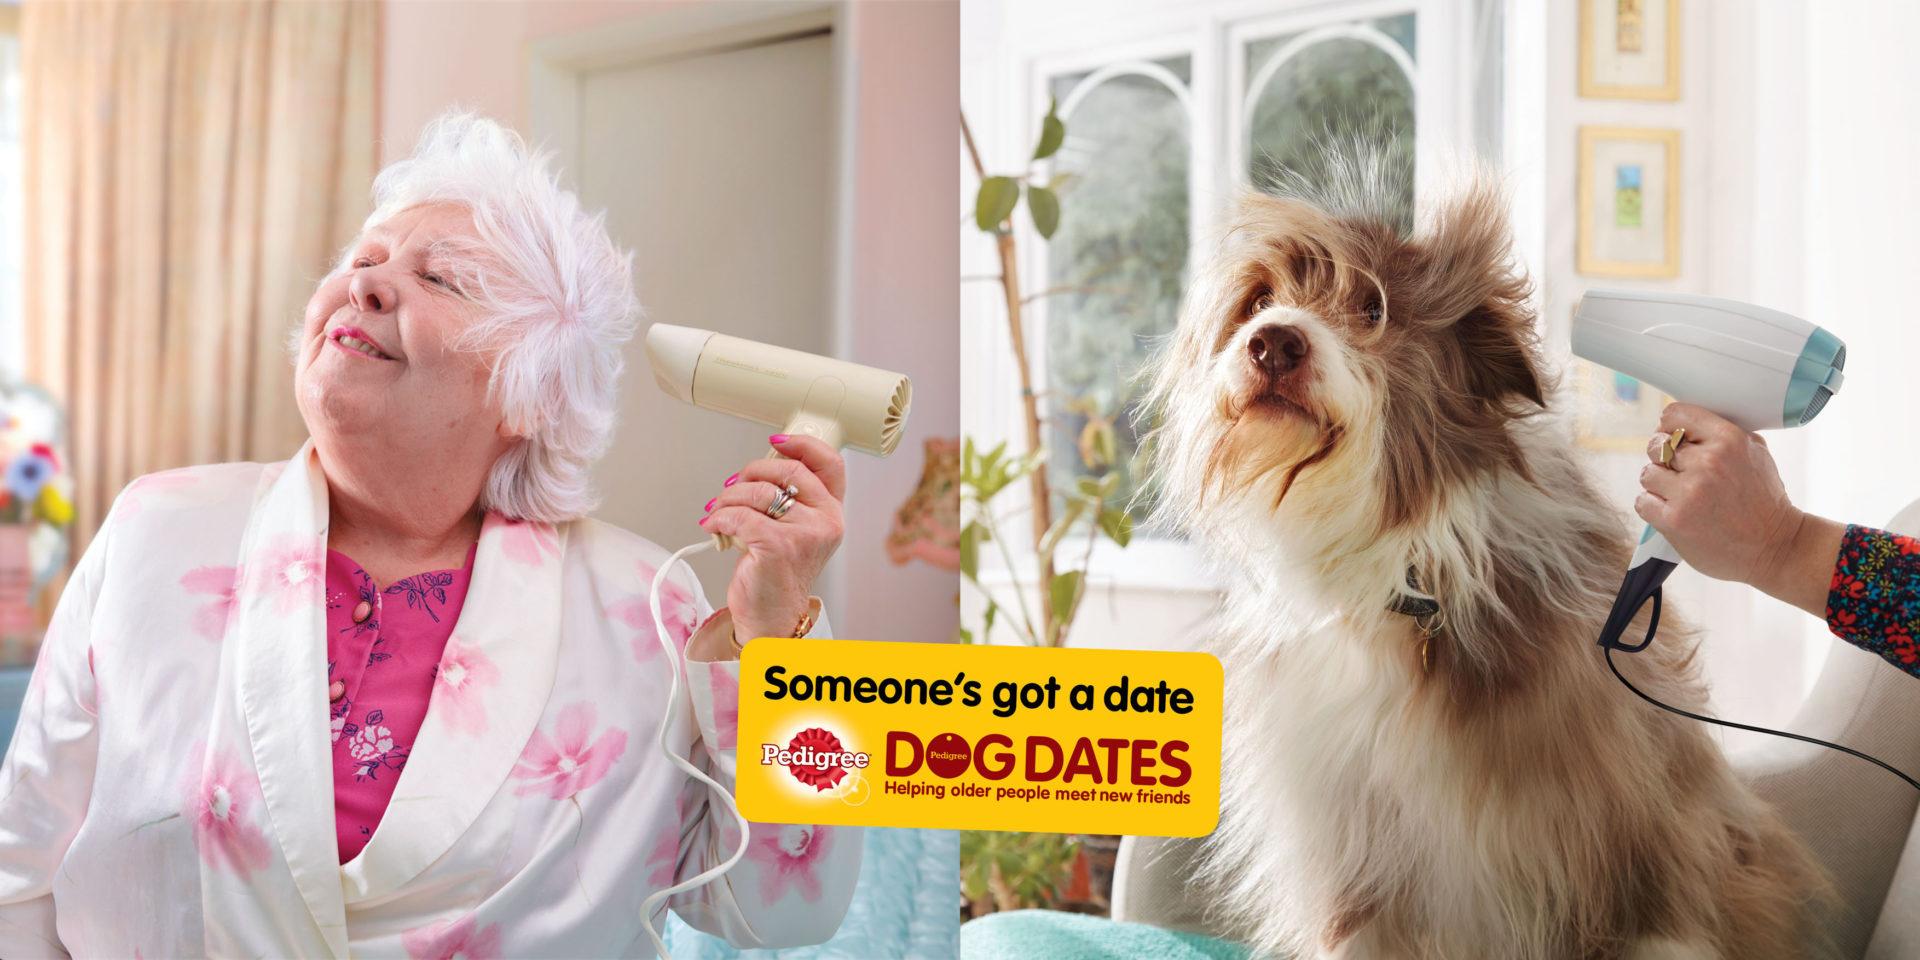 woman blowdrying hair Shaw and Shaw dog washing Advertising Photographers – doggy dates Pedigree dog food AMVDDBO  Dog Grooming